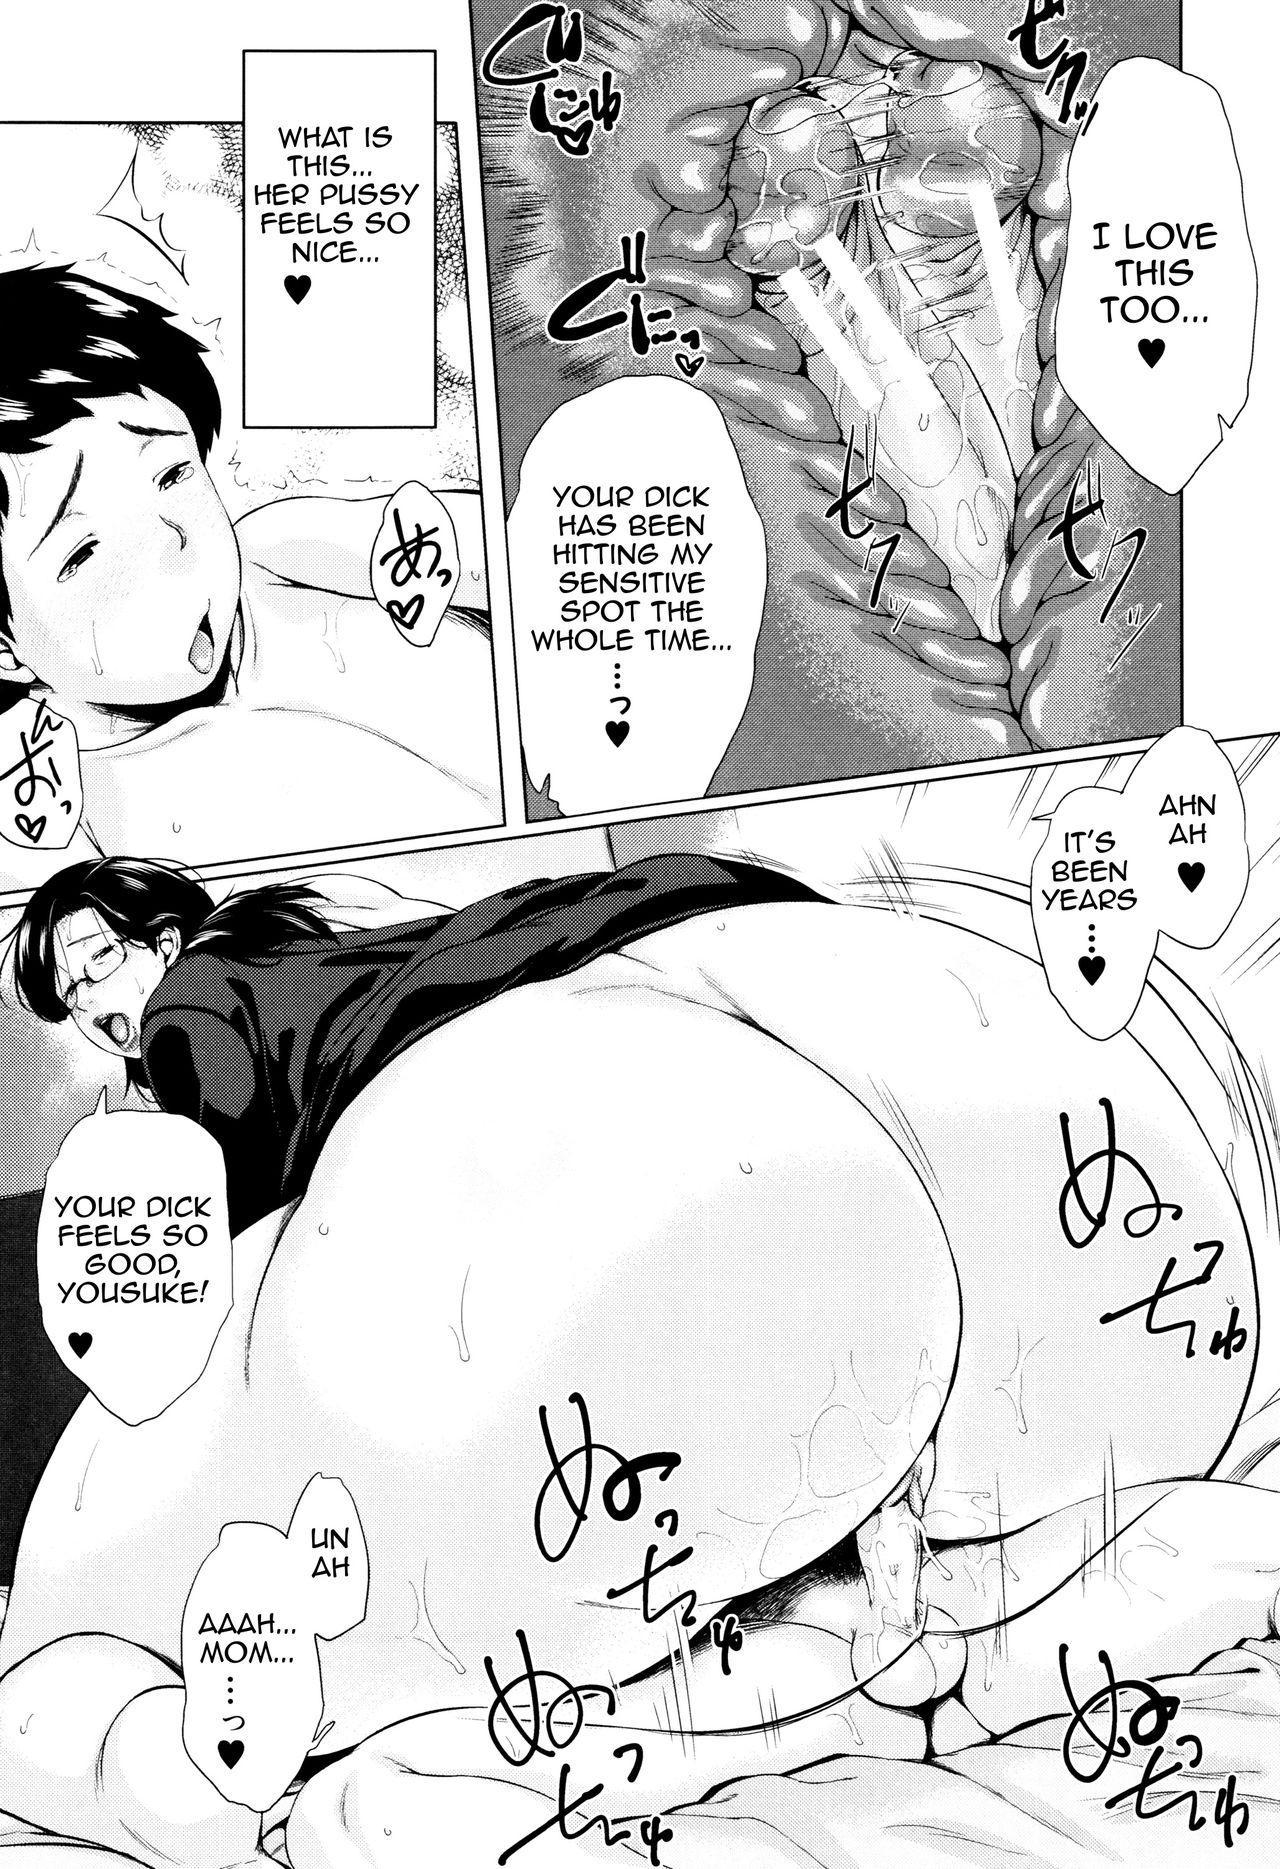 [Jitsuma] Kinyoubi no Haha-tachi e - To Friday's mothers [English] [Amoskandy, desudesu, Kusanyagi] 123